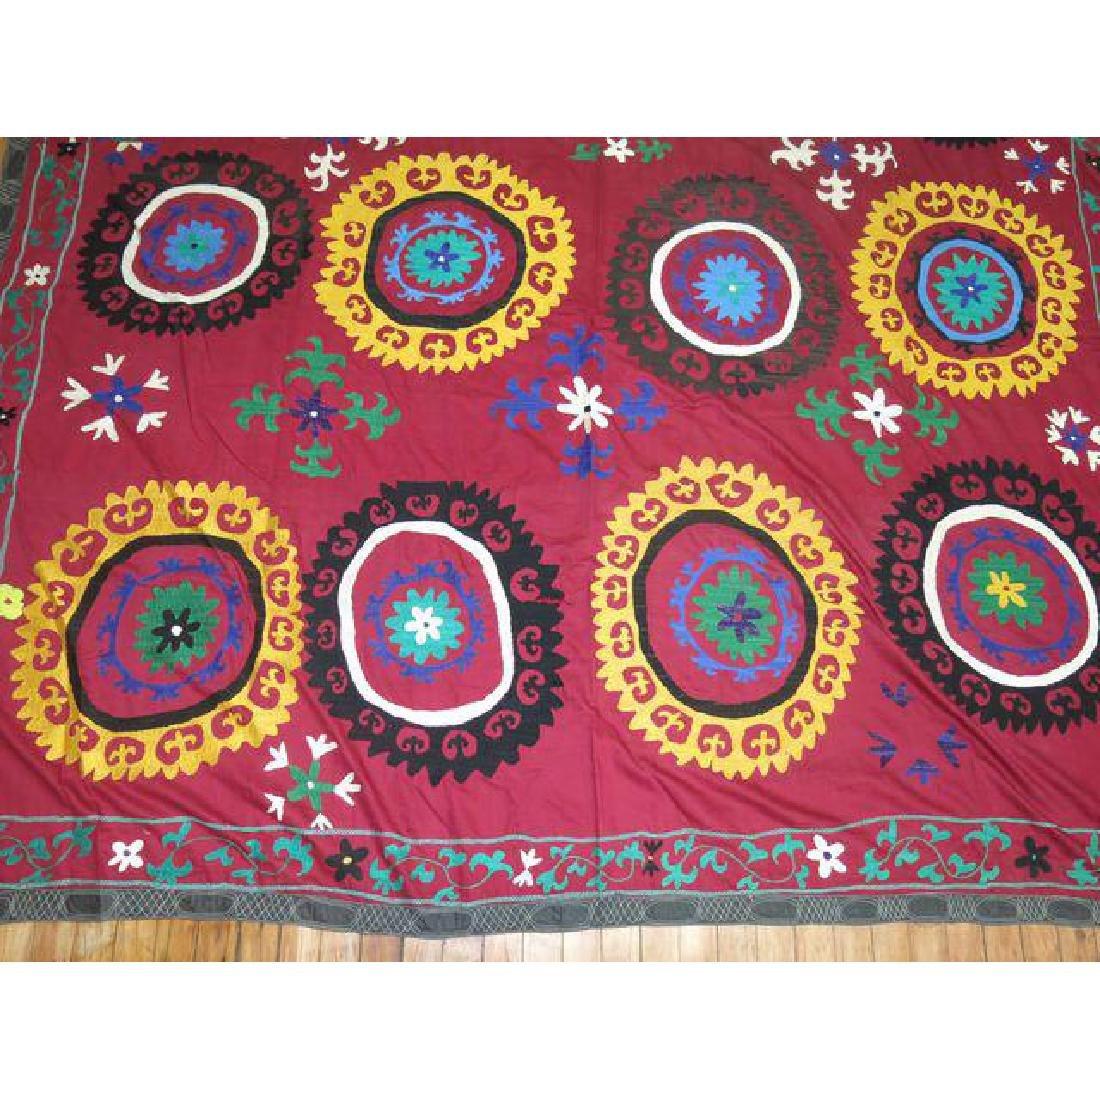 Vintage Suzanni Embroidery Throw 6.10x7.5 - 5